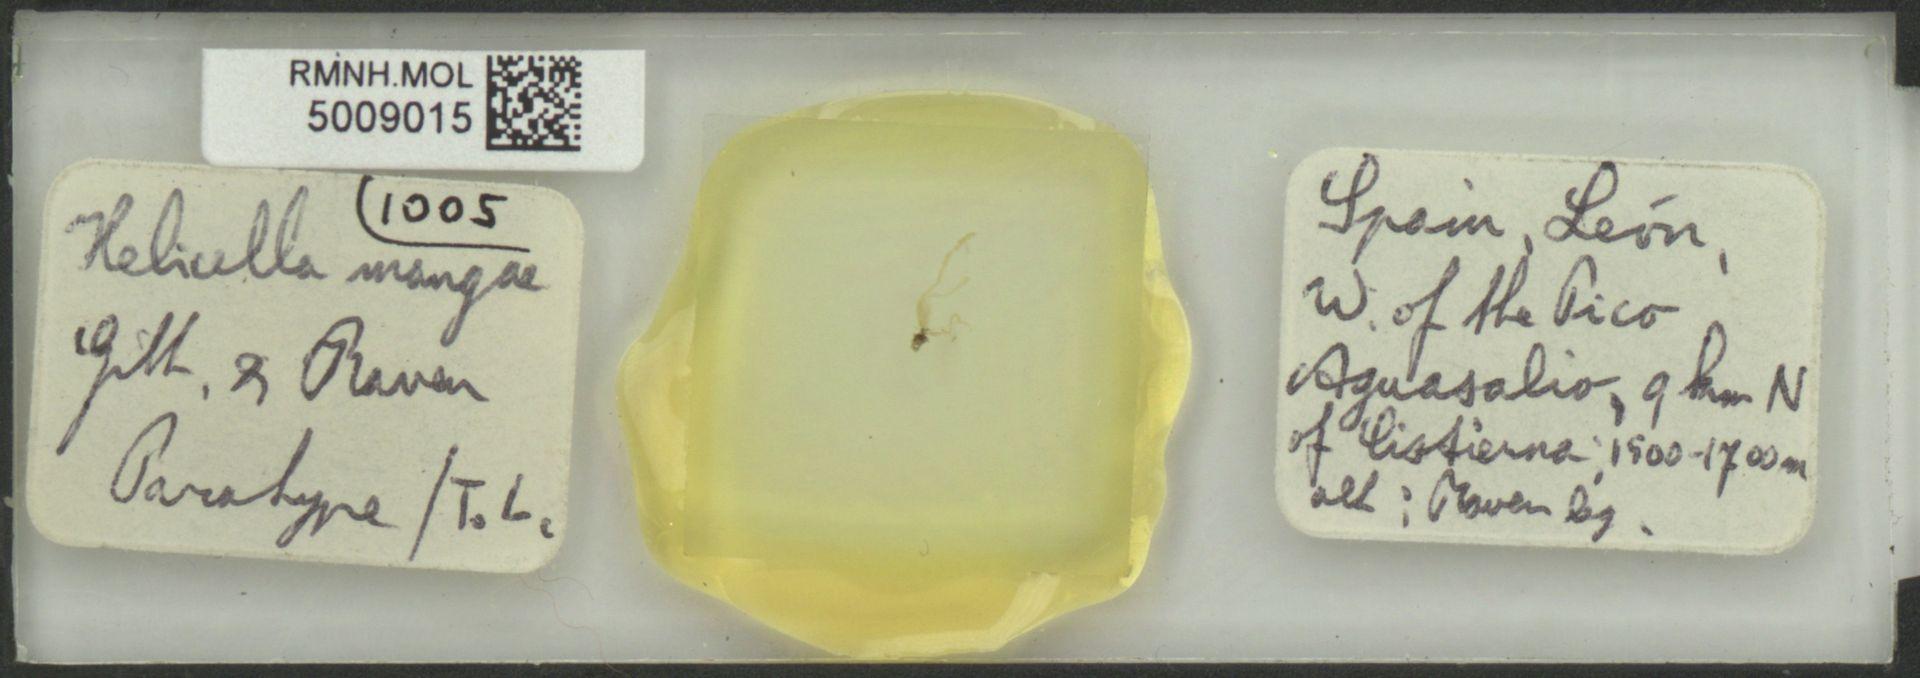 RMNH.MOL.5009015 | Helicella mangae Gittenberger & Raven, 1982